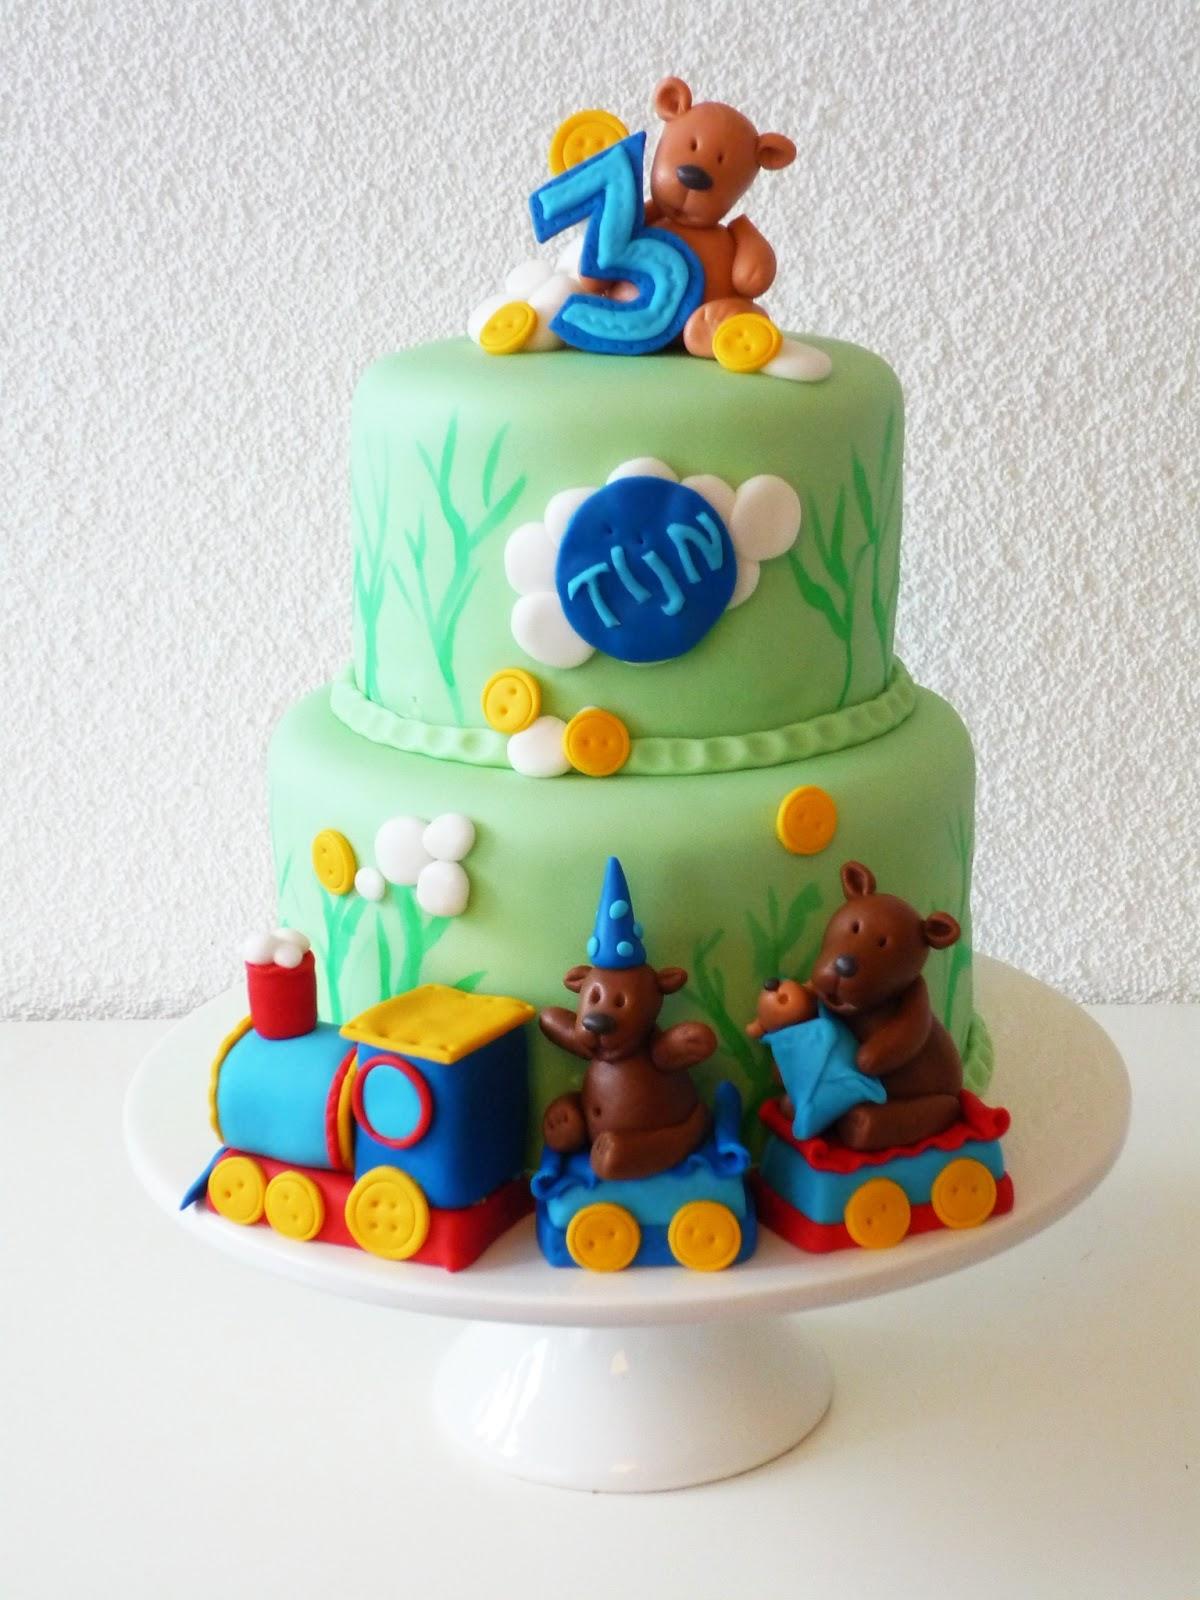 Favoriete Karen Anne Cakes: Trein taart met geboetseerde beren familie @HG-52